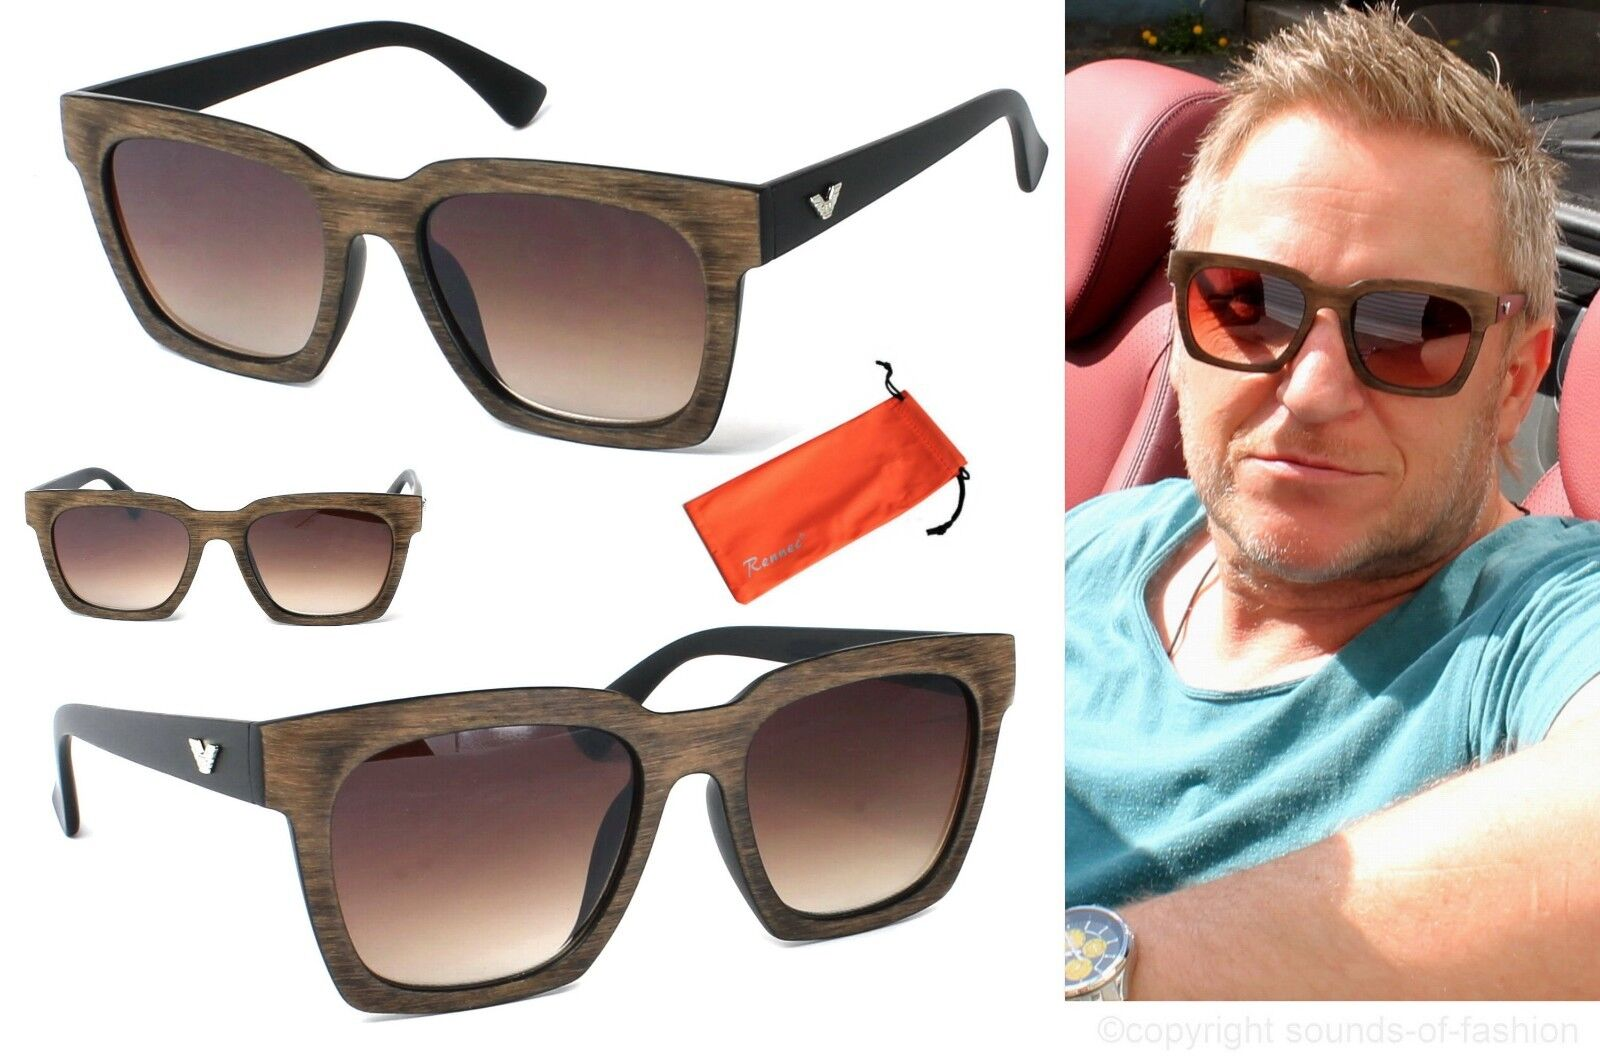 Herren Sonnenbrille XL Quadrat Schwarz Braun Verlauf Edle fühlbare Holz Optik V